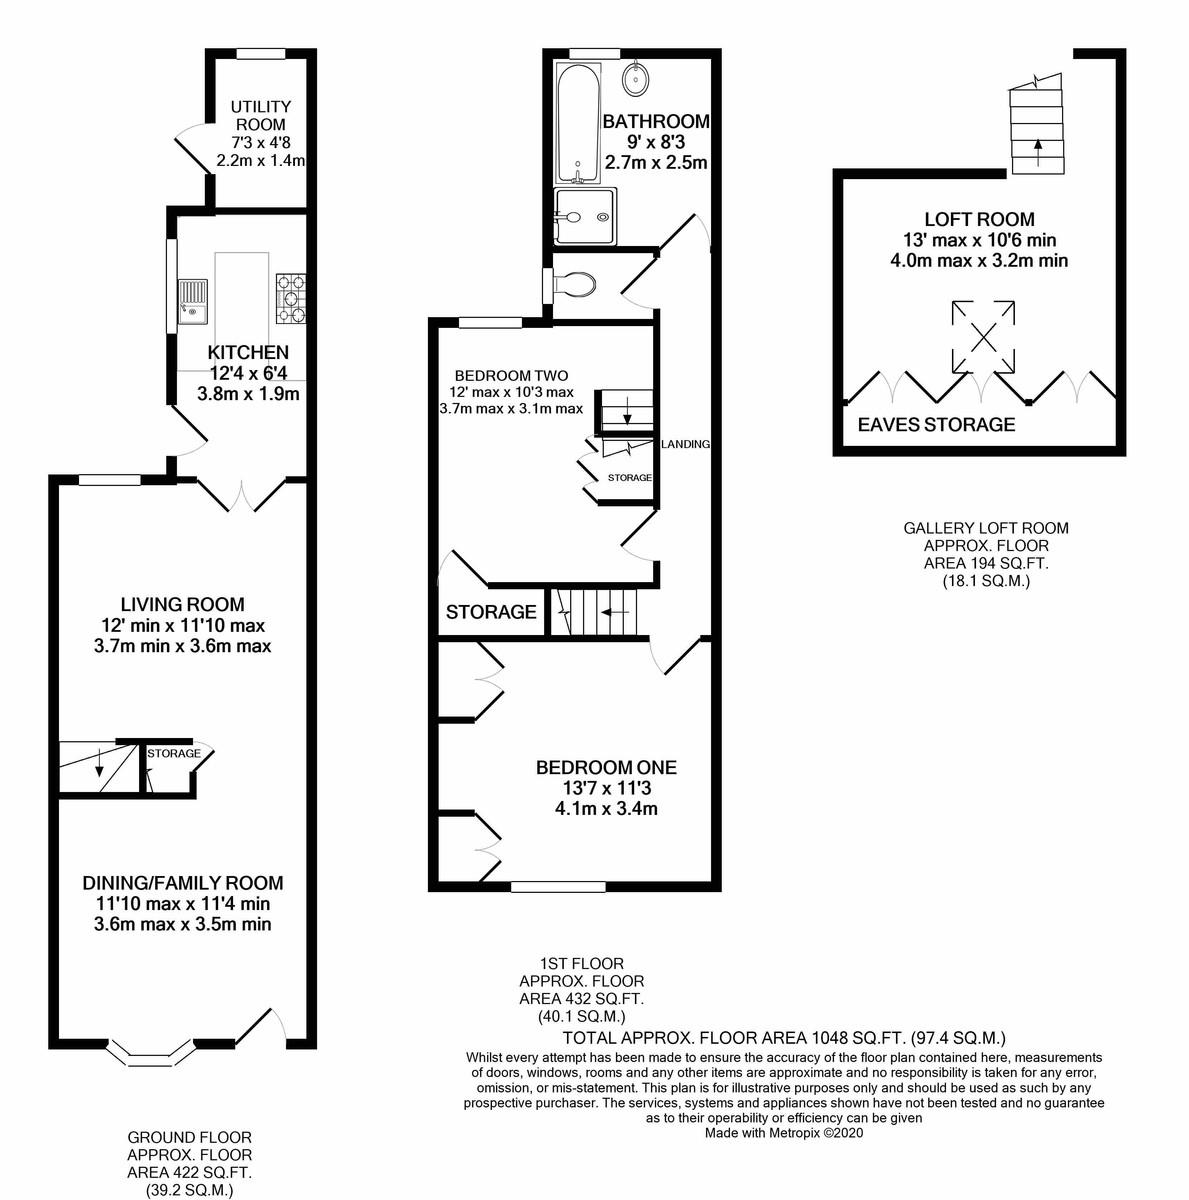 South Street, Harborne floorplan 1 of 1